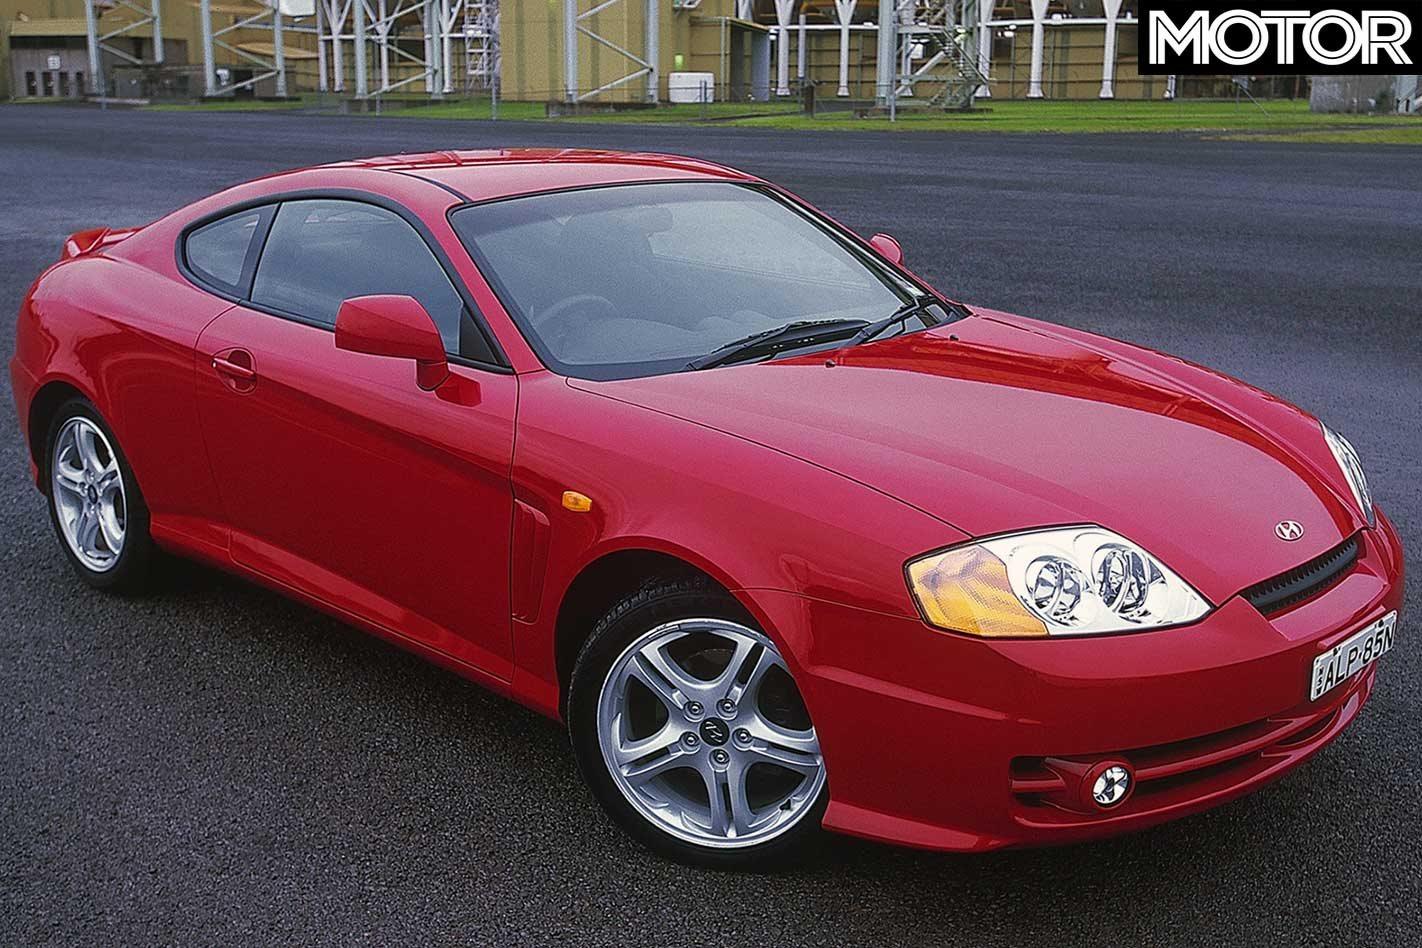 2002 Hyundai Tiburon V6 Review  Classic Motor